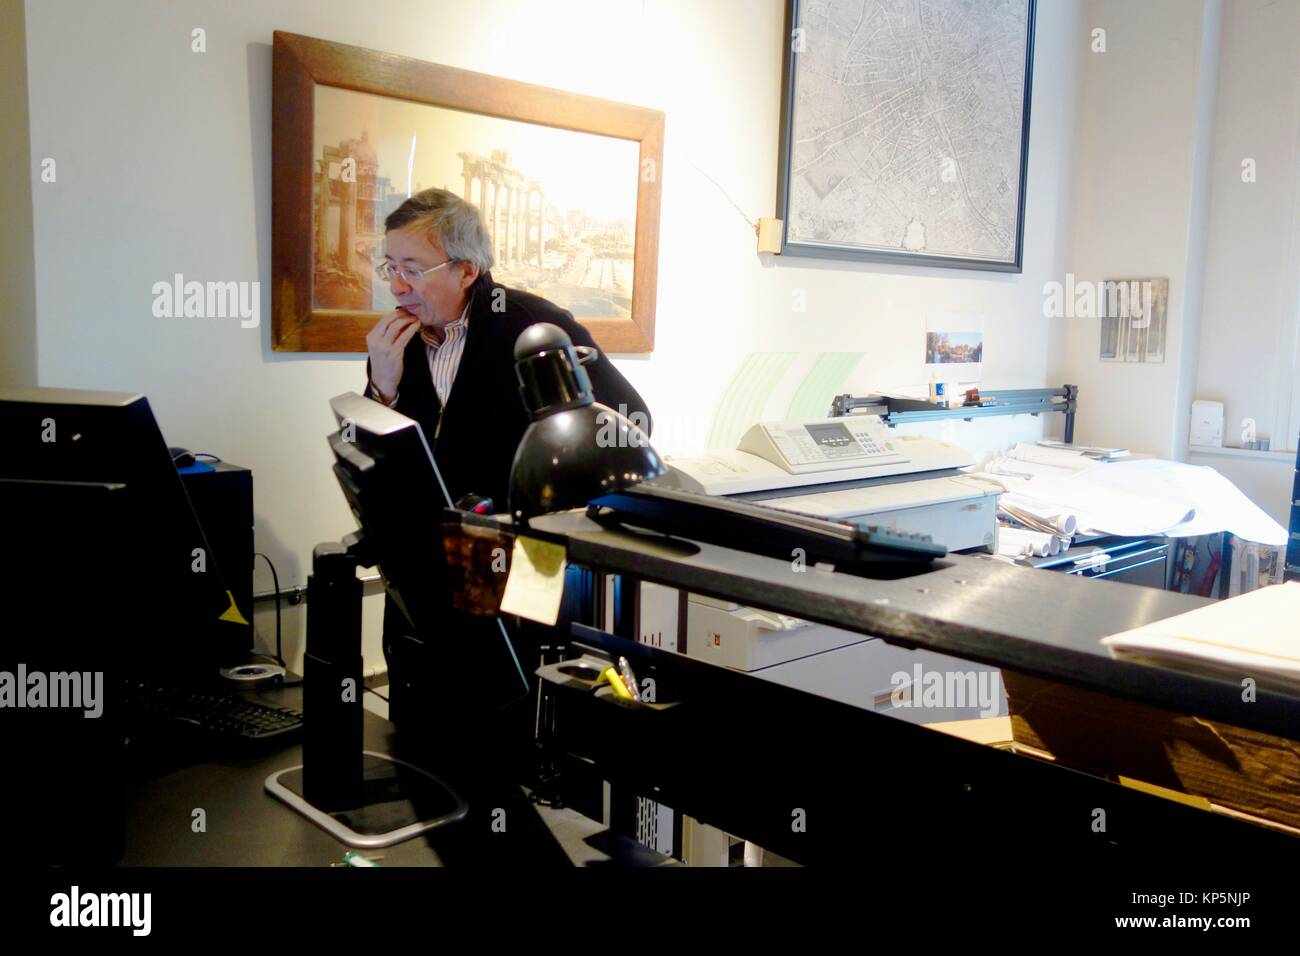 Architect Working in Office, Boston, Massachusetts, USA. - Stock Image